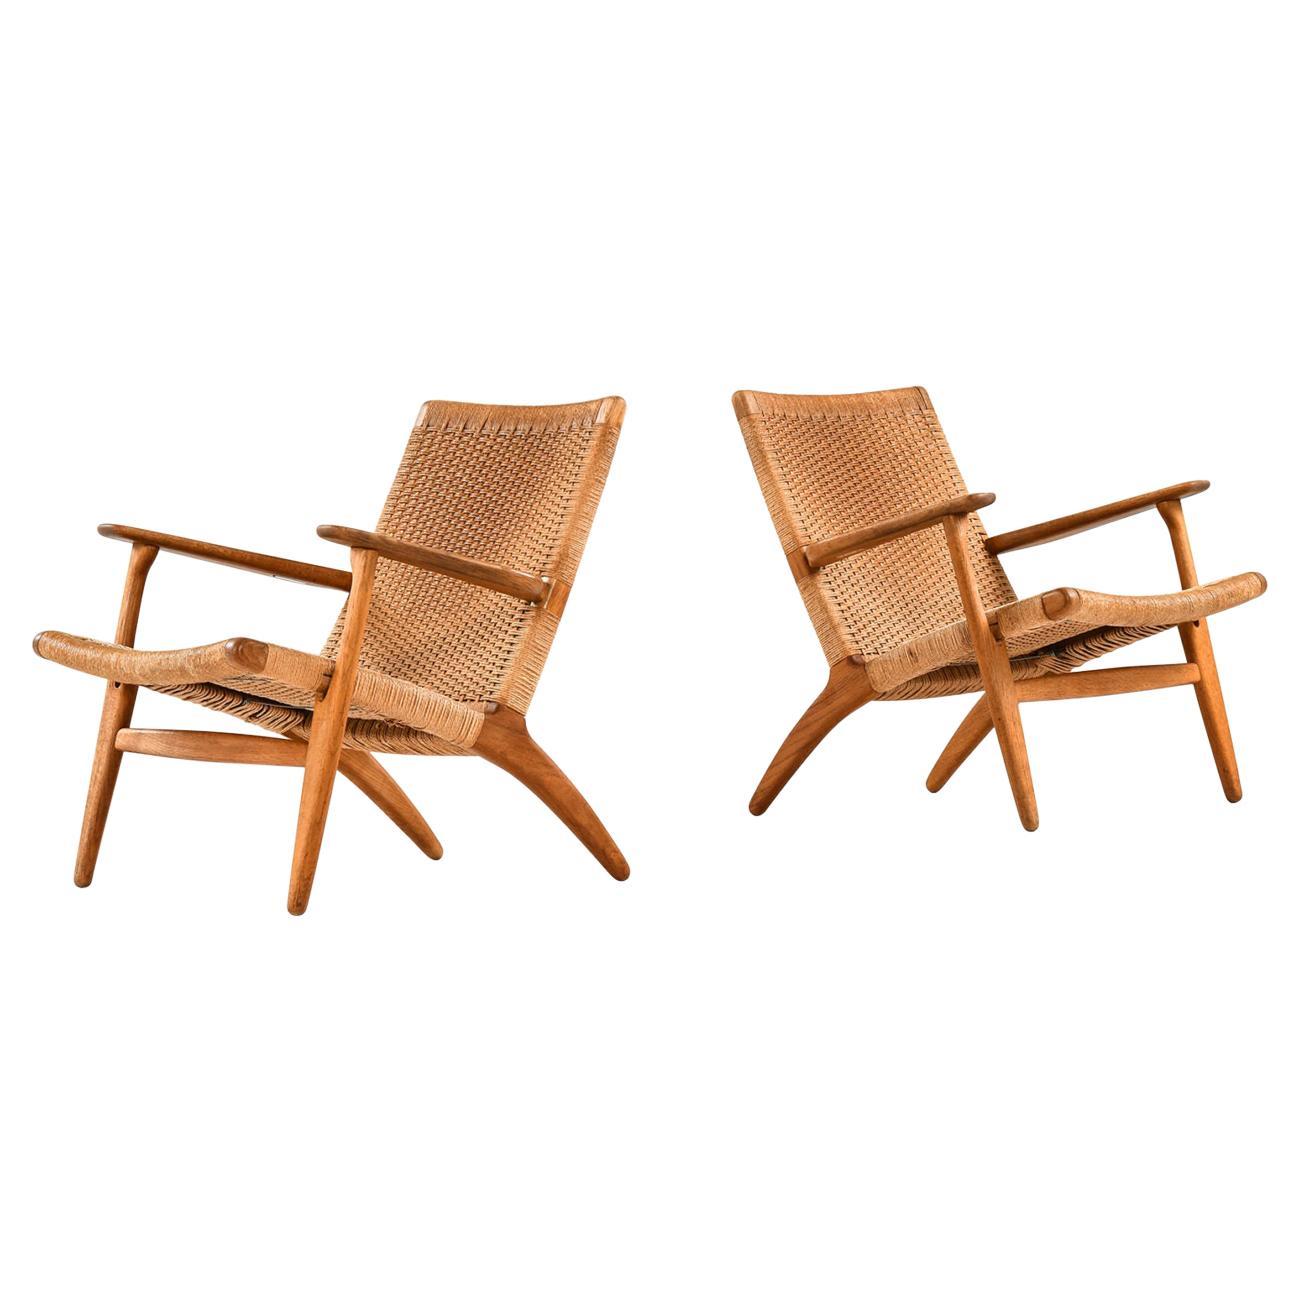 Hans Wegner Easy Chairs Model CH-25 Produced by Carl Hansen & Son in Denmark